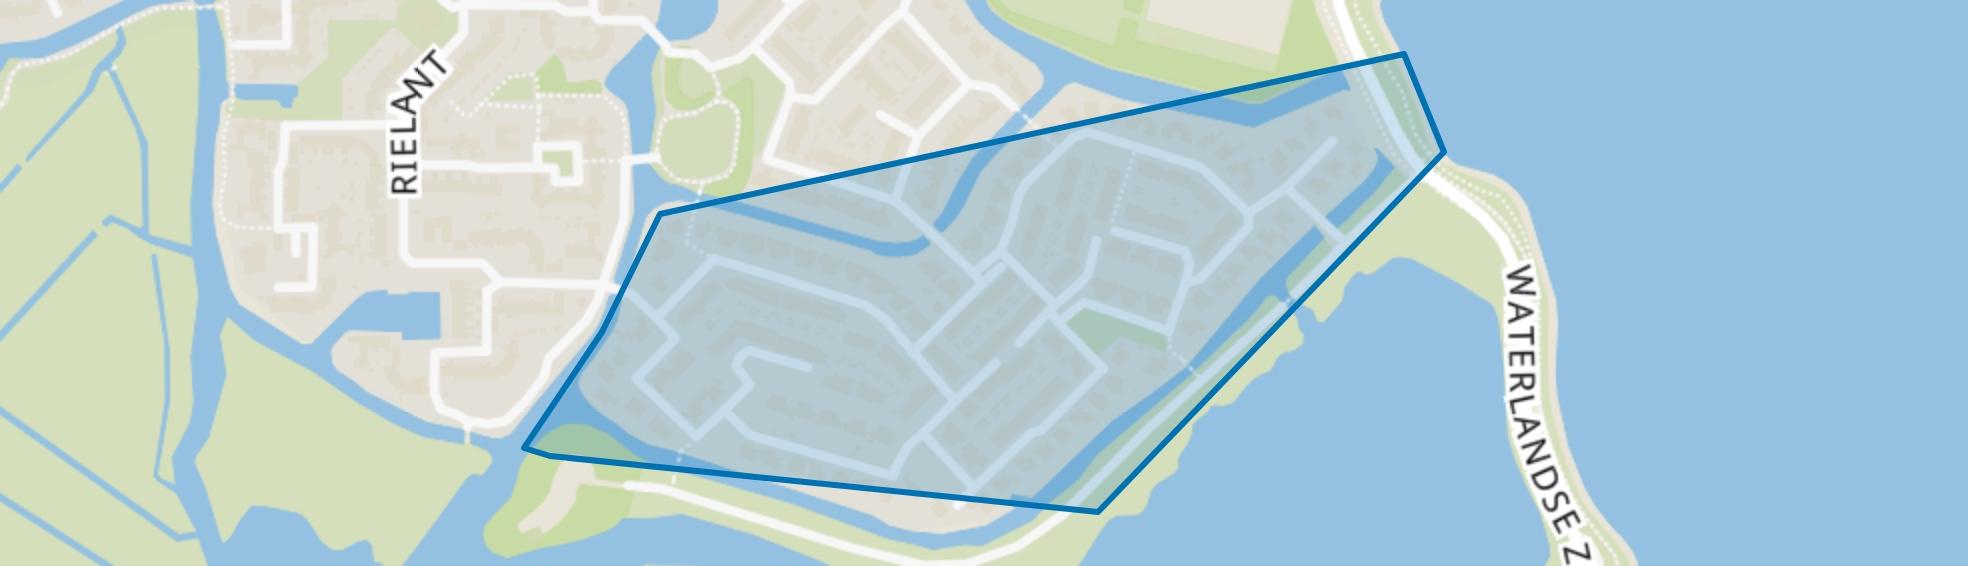 Buitengouw, Monnickendam map